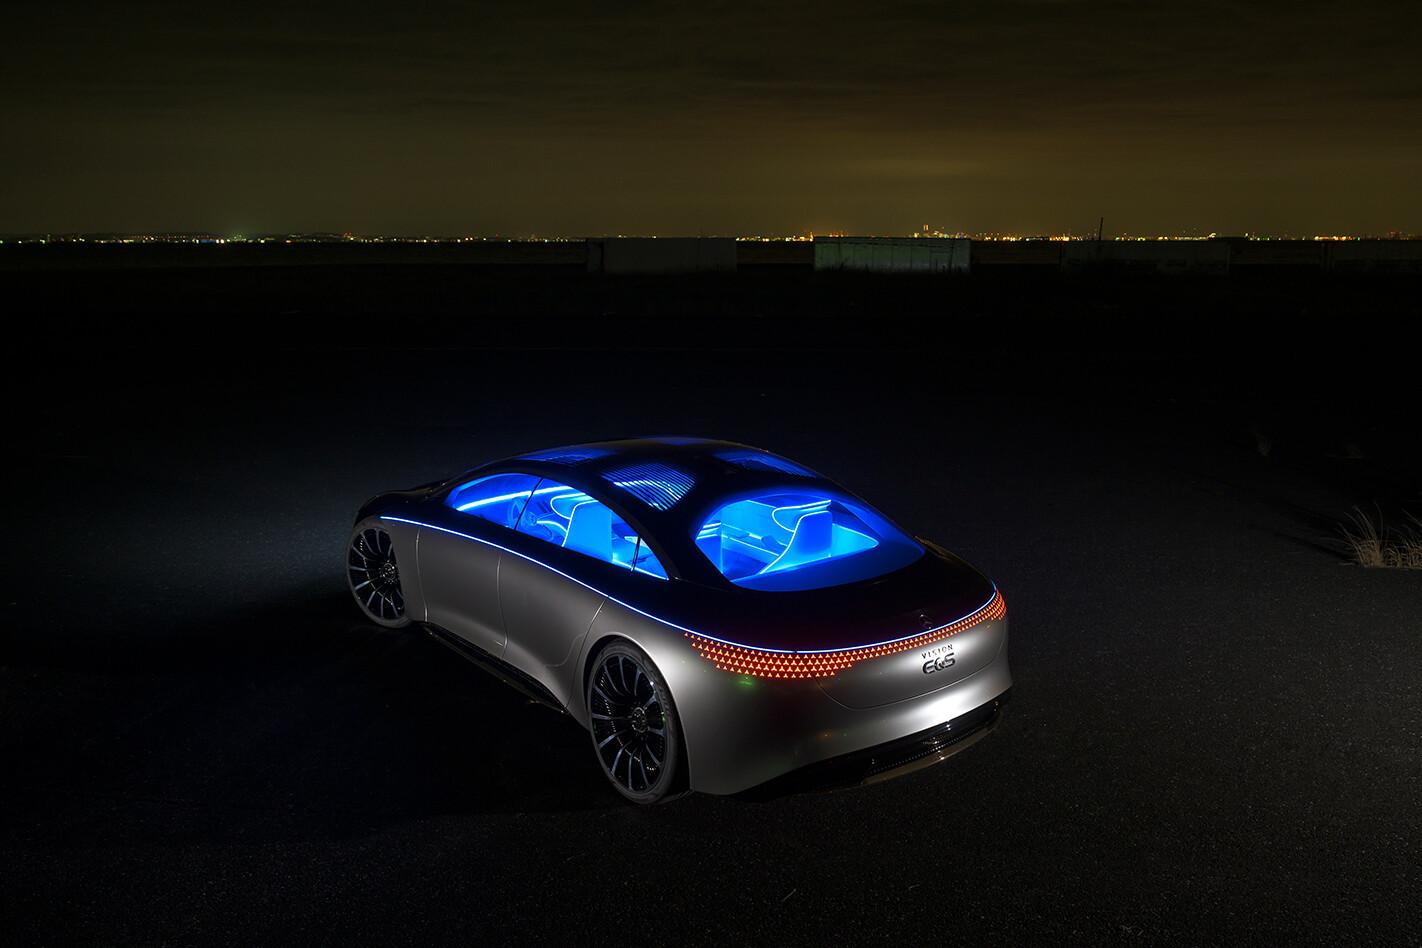 2020 Mercedes-Benz EQS concept - illuminated cabin